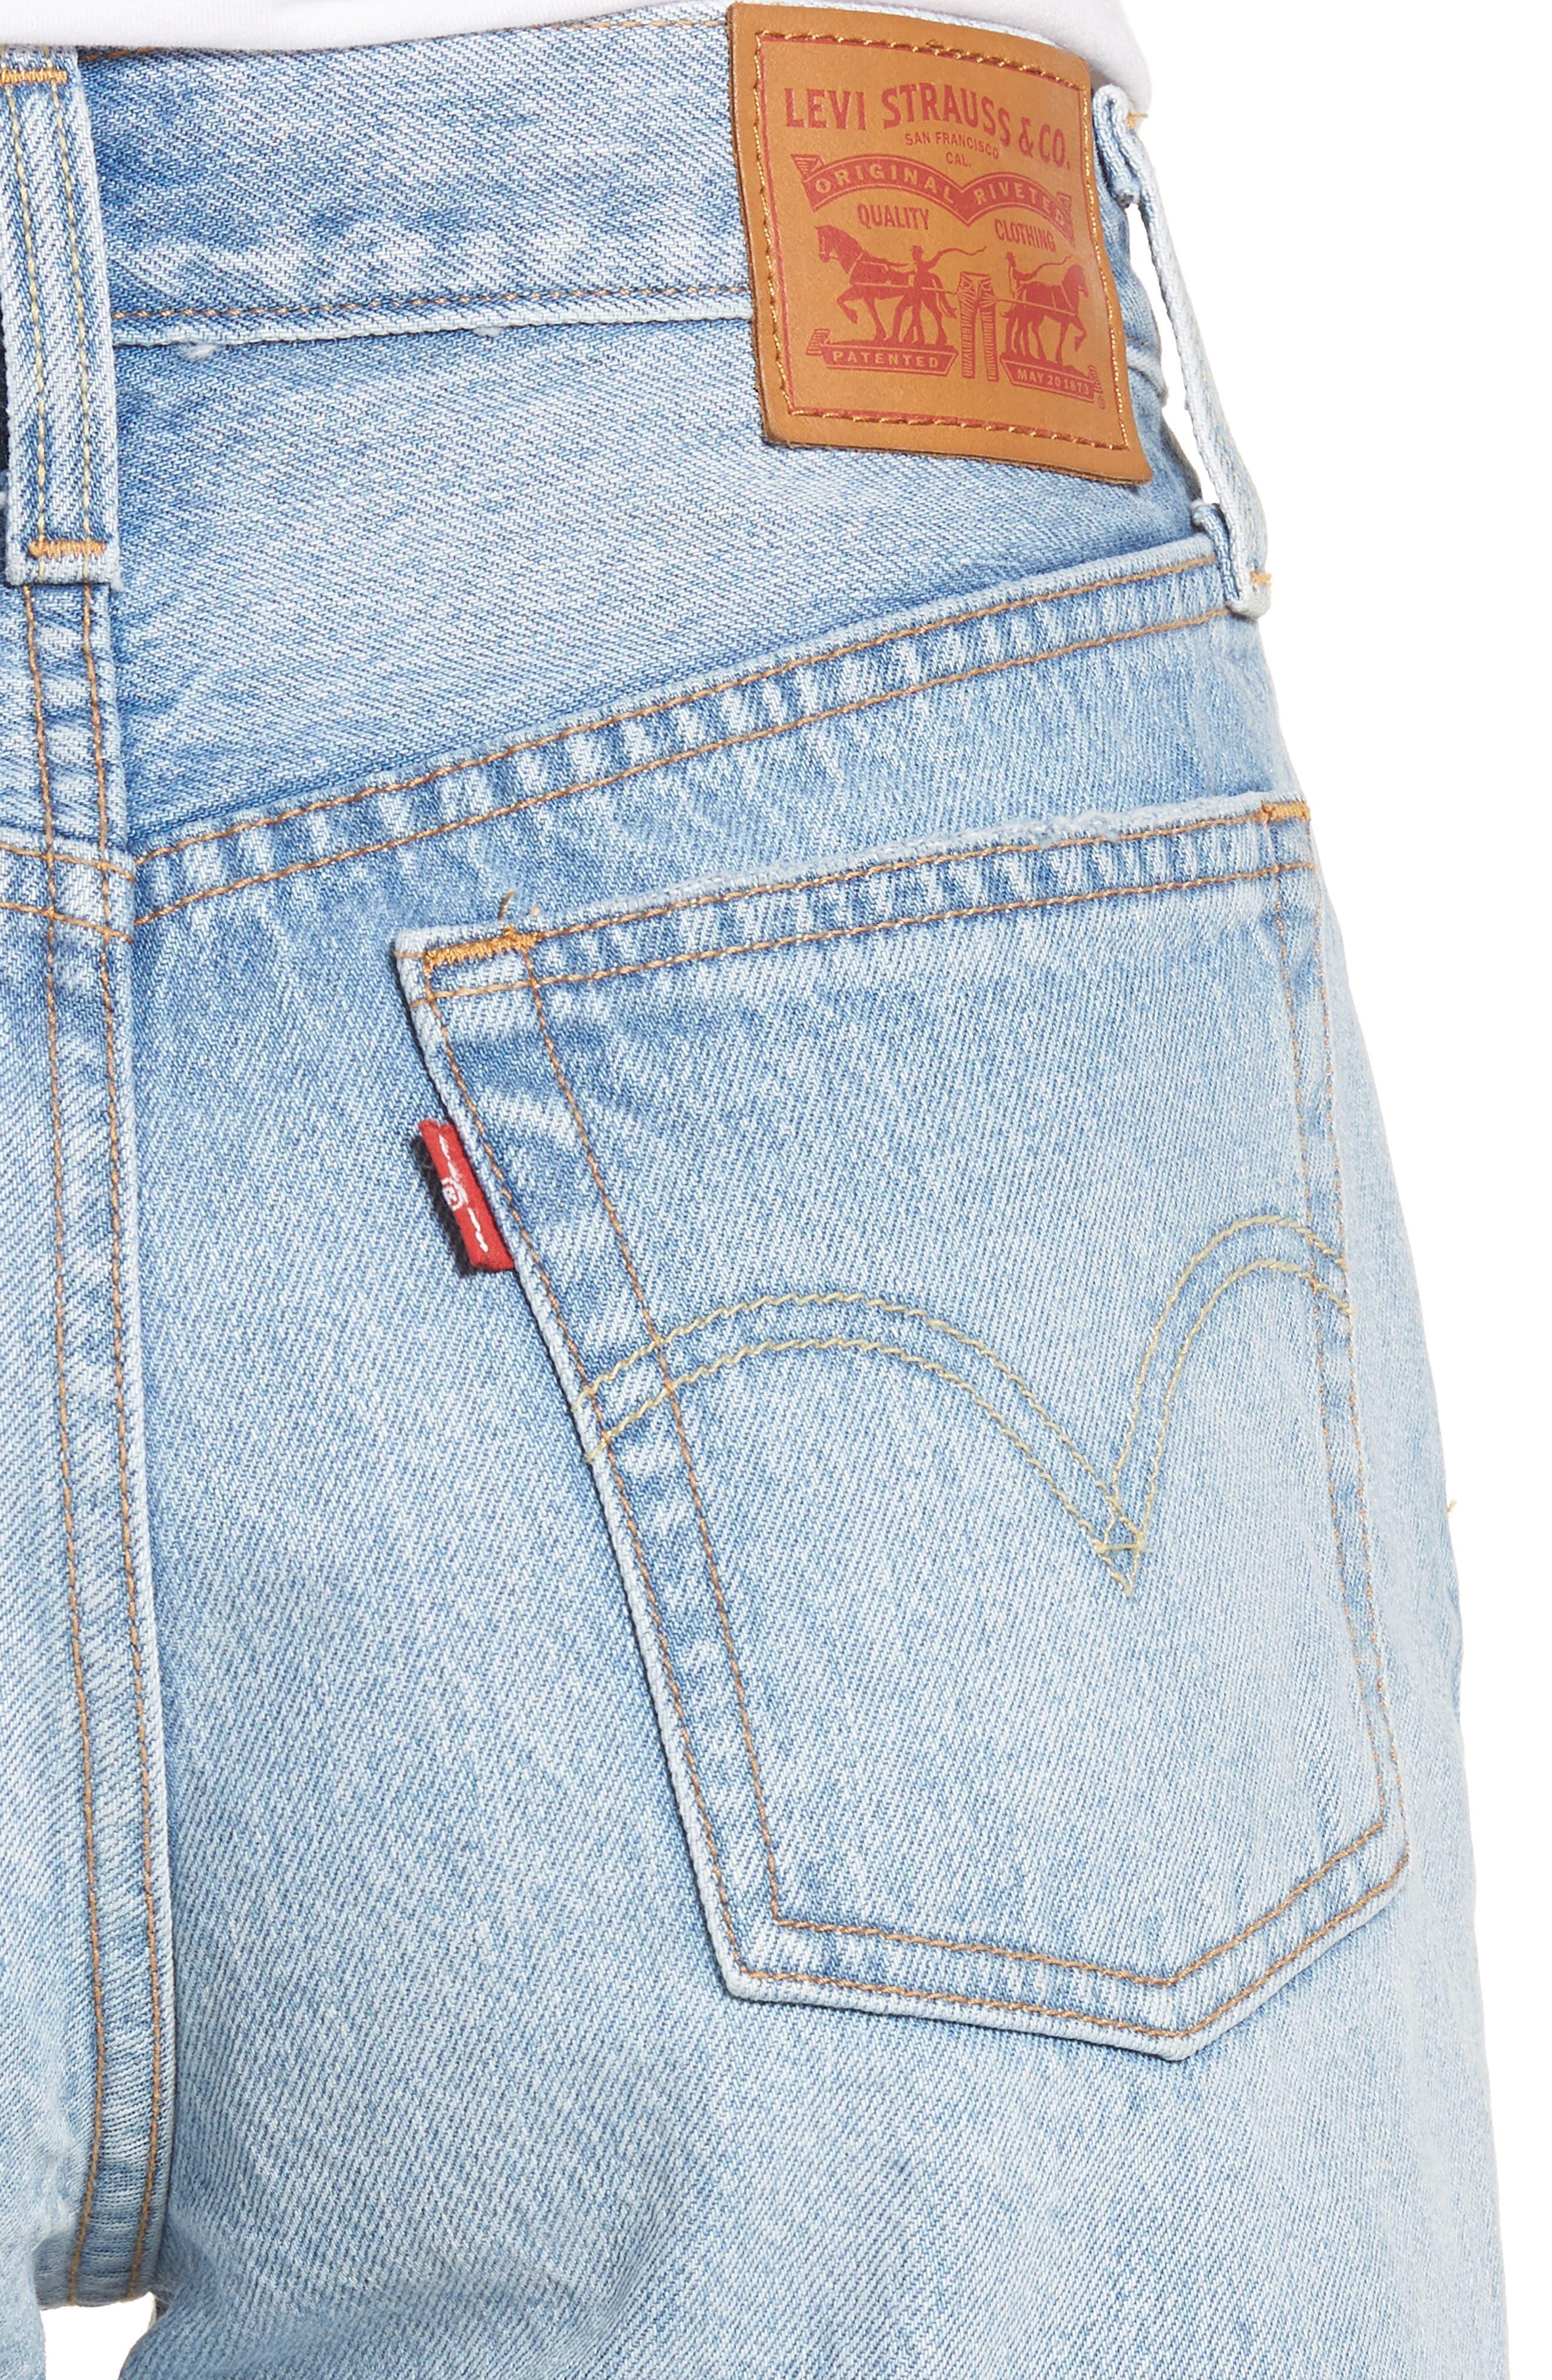 Indie Shredded Shorts,                             Alternate thumbnail 4, color,                             420